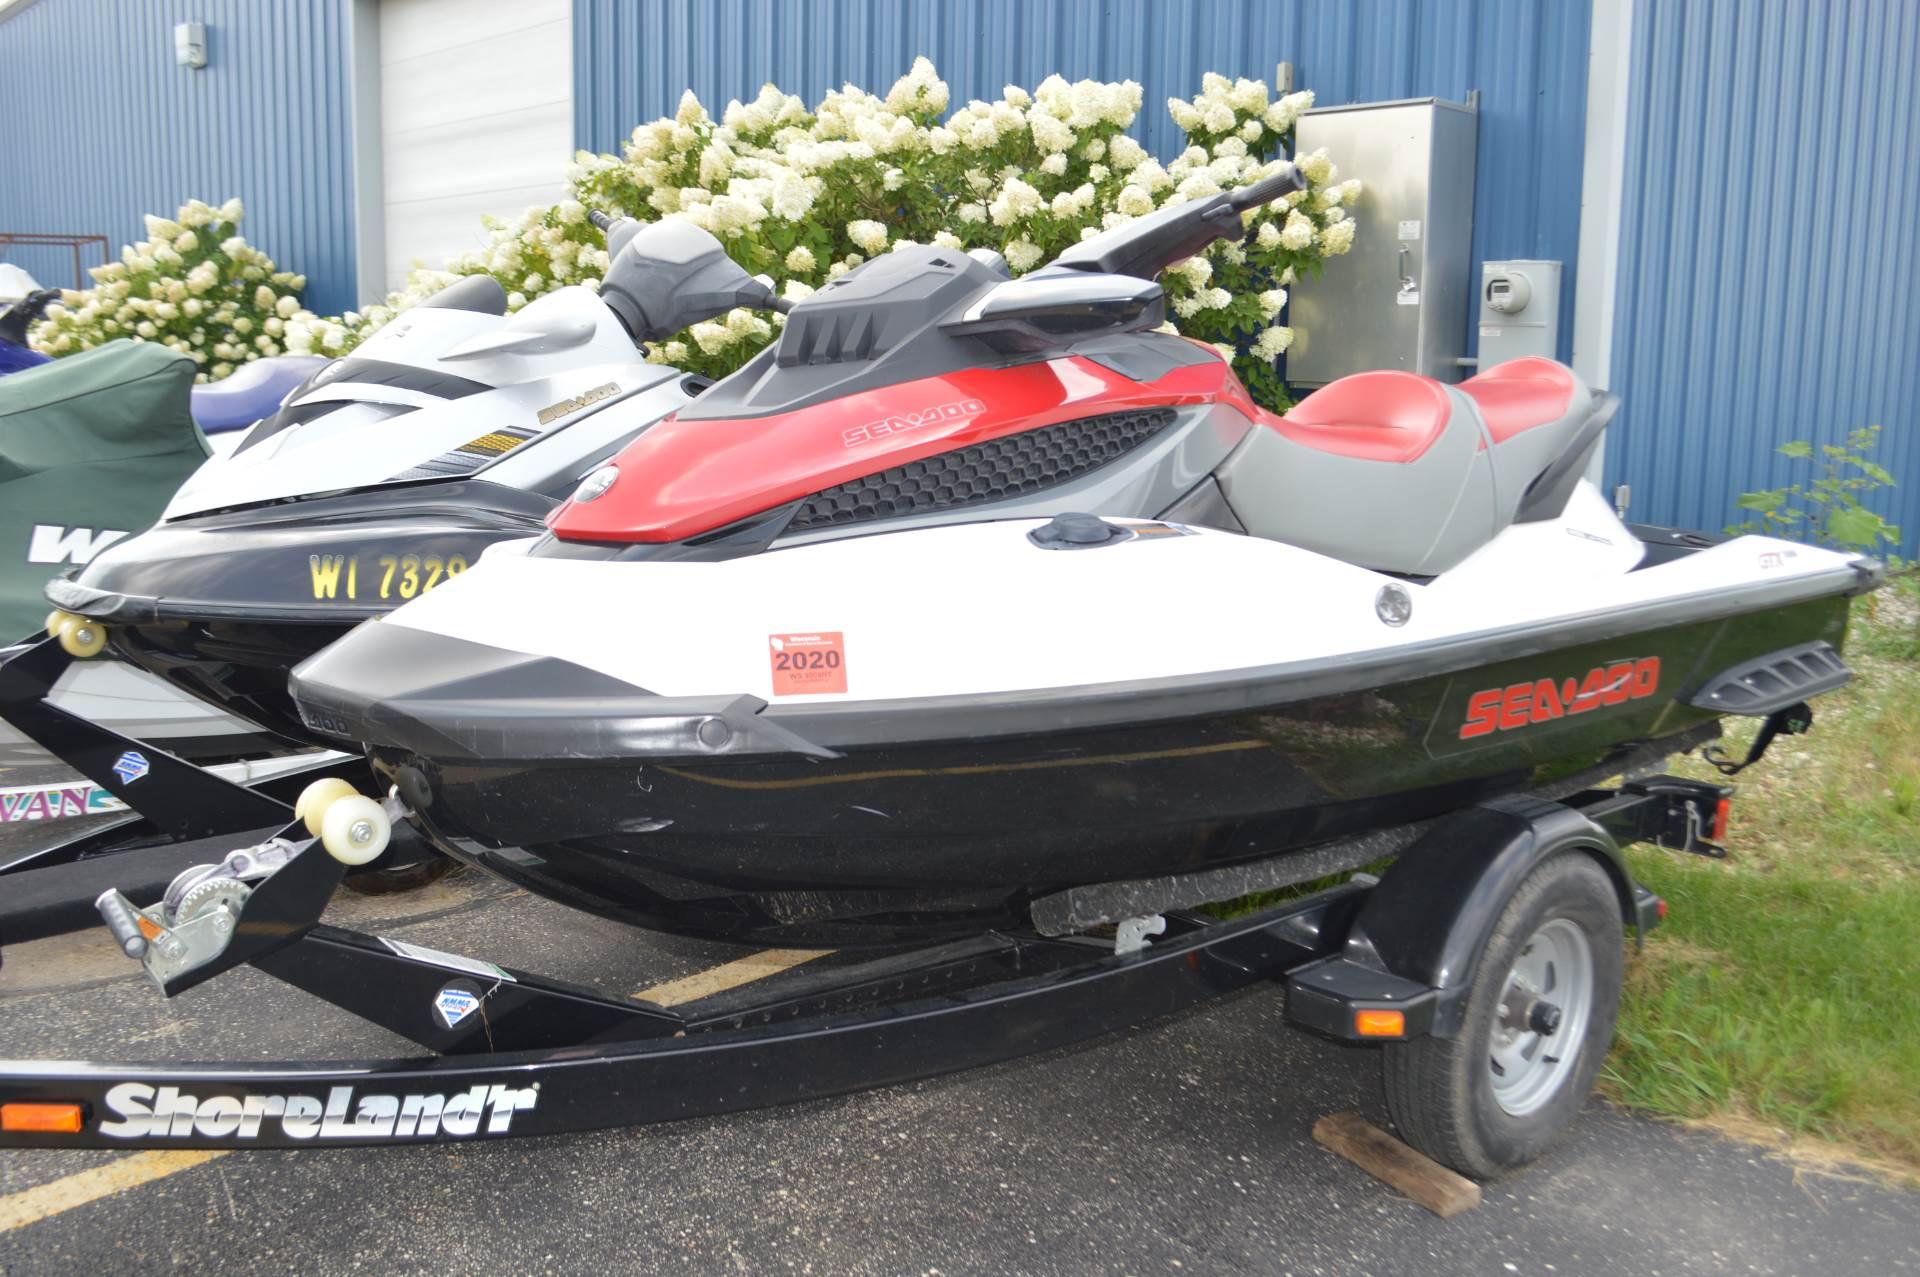 MAXXX MOTORSPORTS Inventory - Dealer in Darien, WI 53114